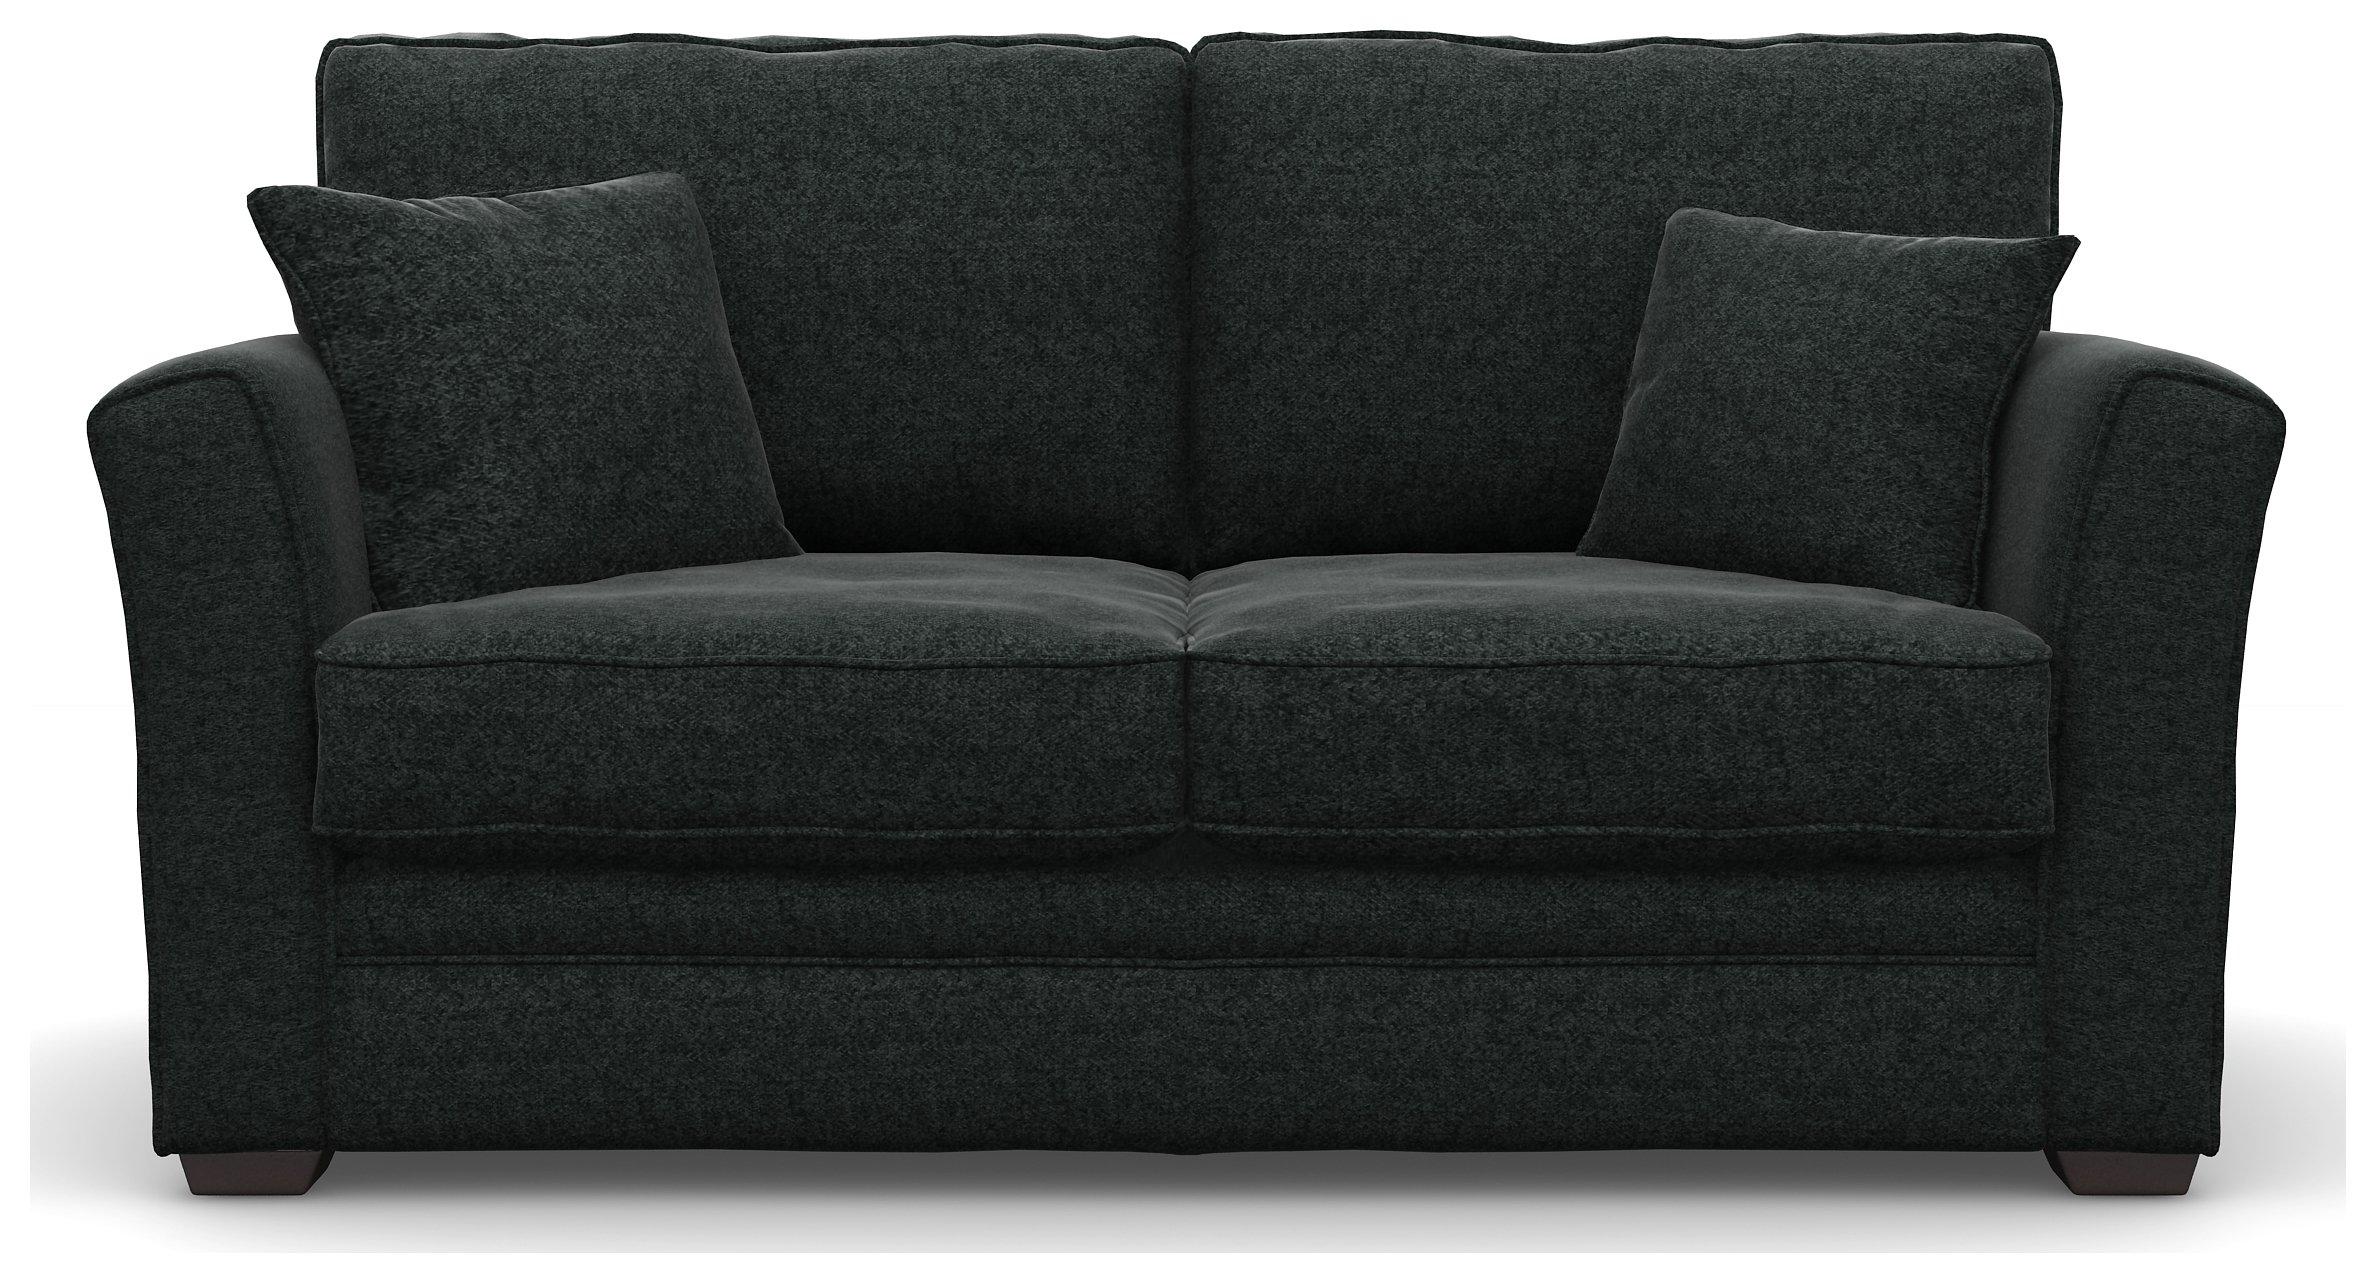 HoH Malton 2 Seat Tweed Fabric Sofa Bed - Charcoal + Black Legs